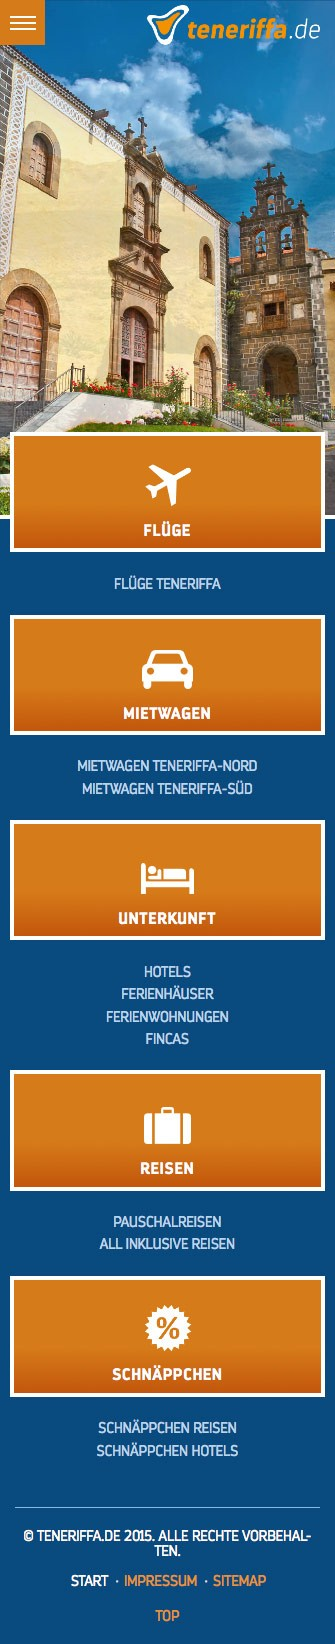 Teneriffa - Mobile